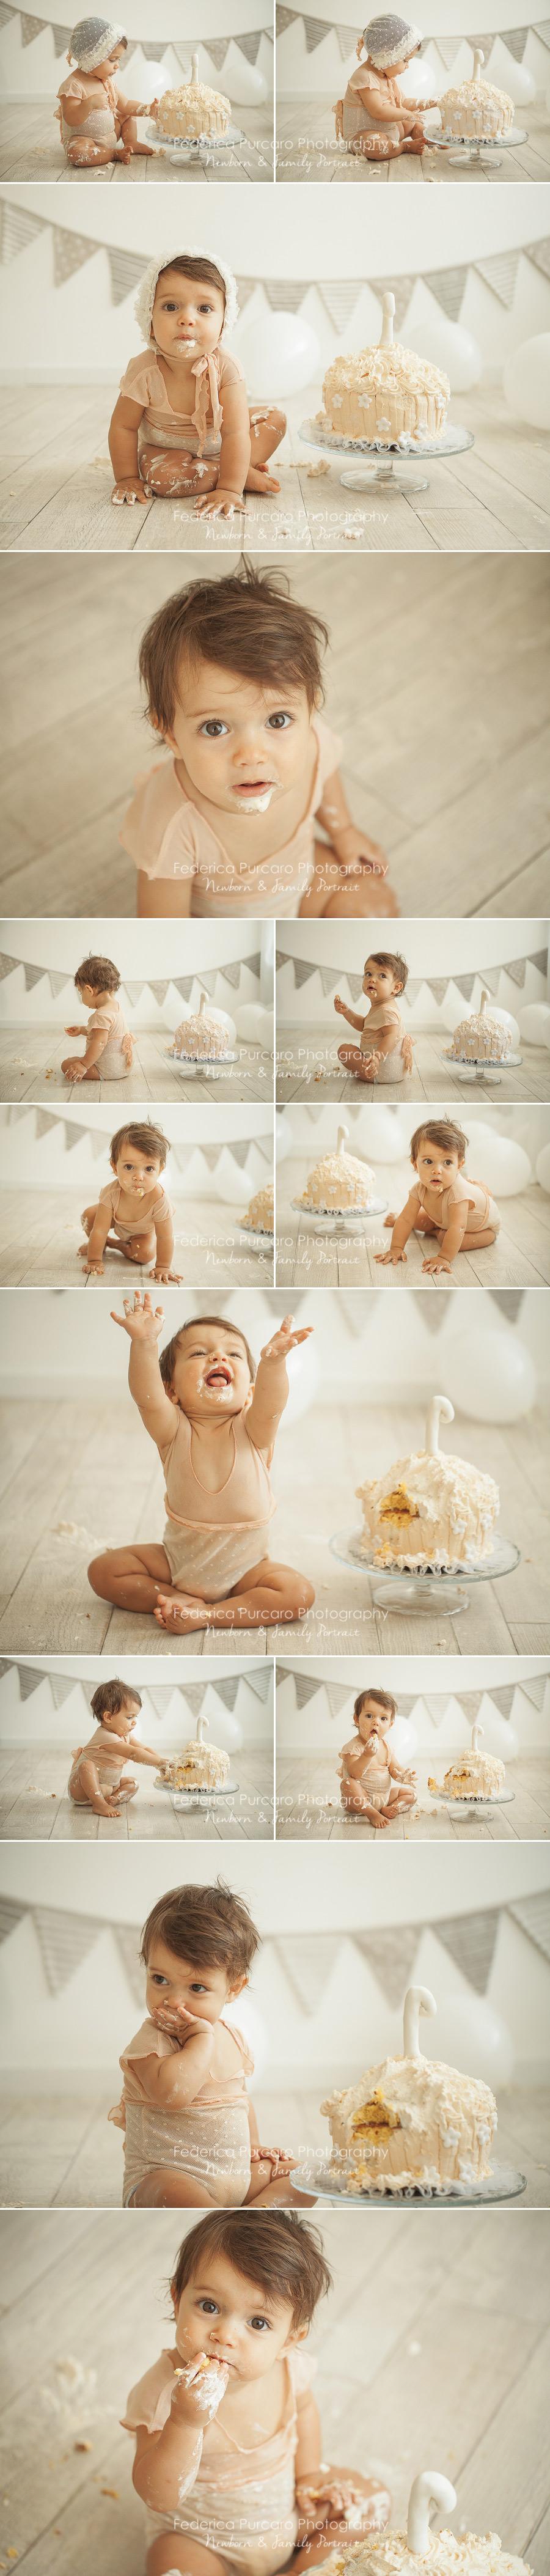 smach cake adele-2